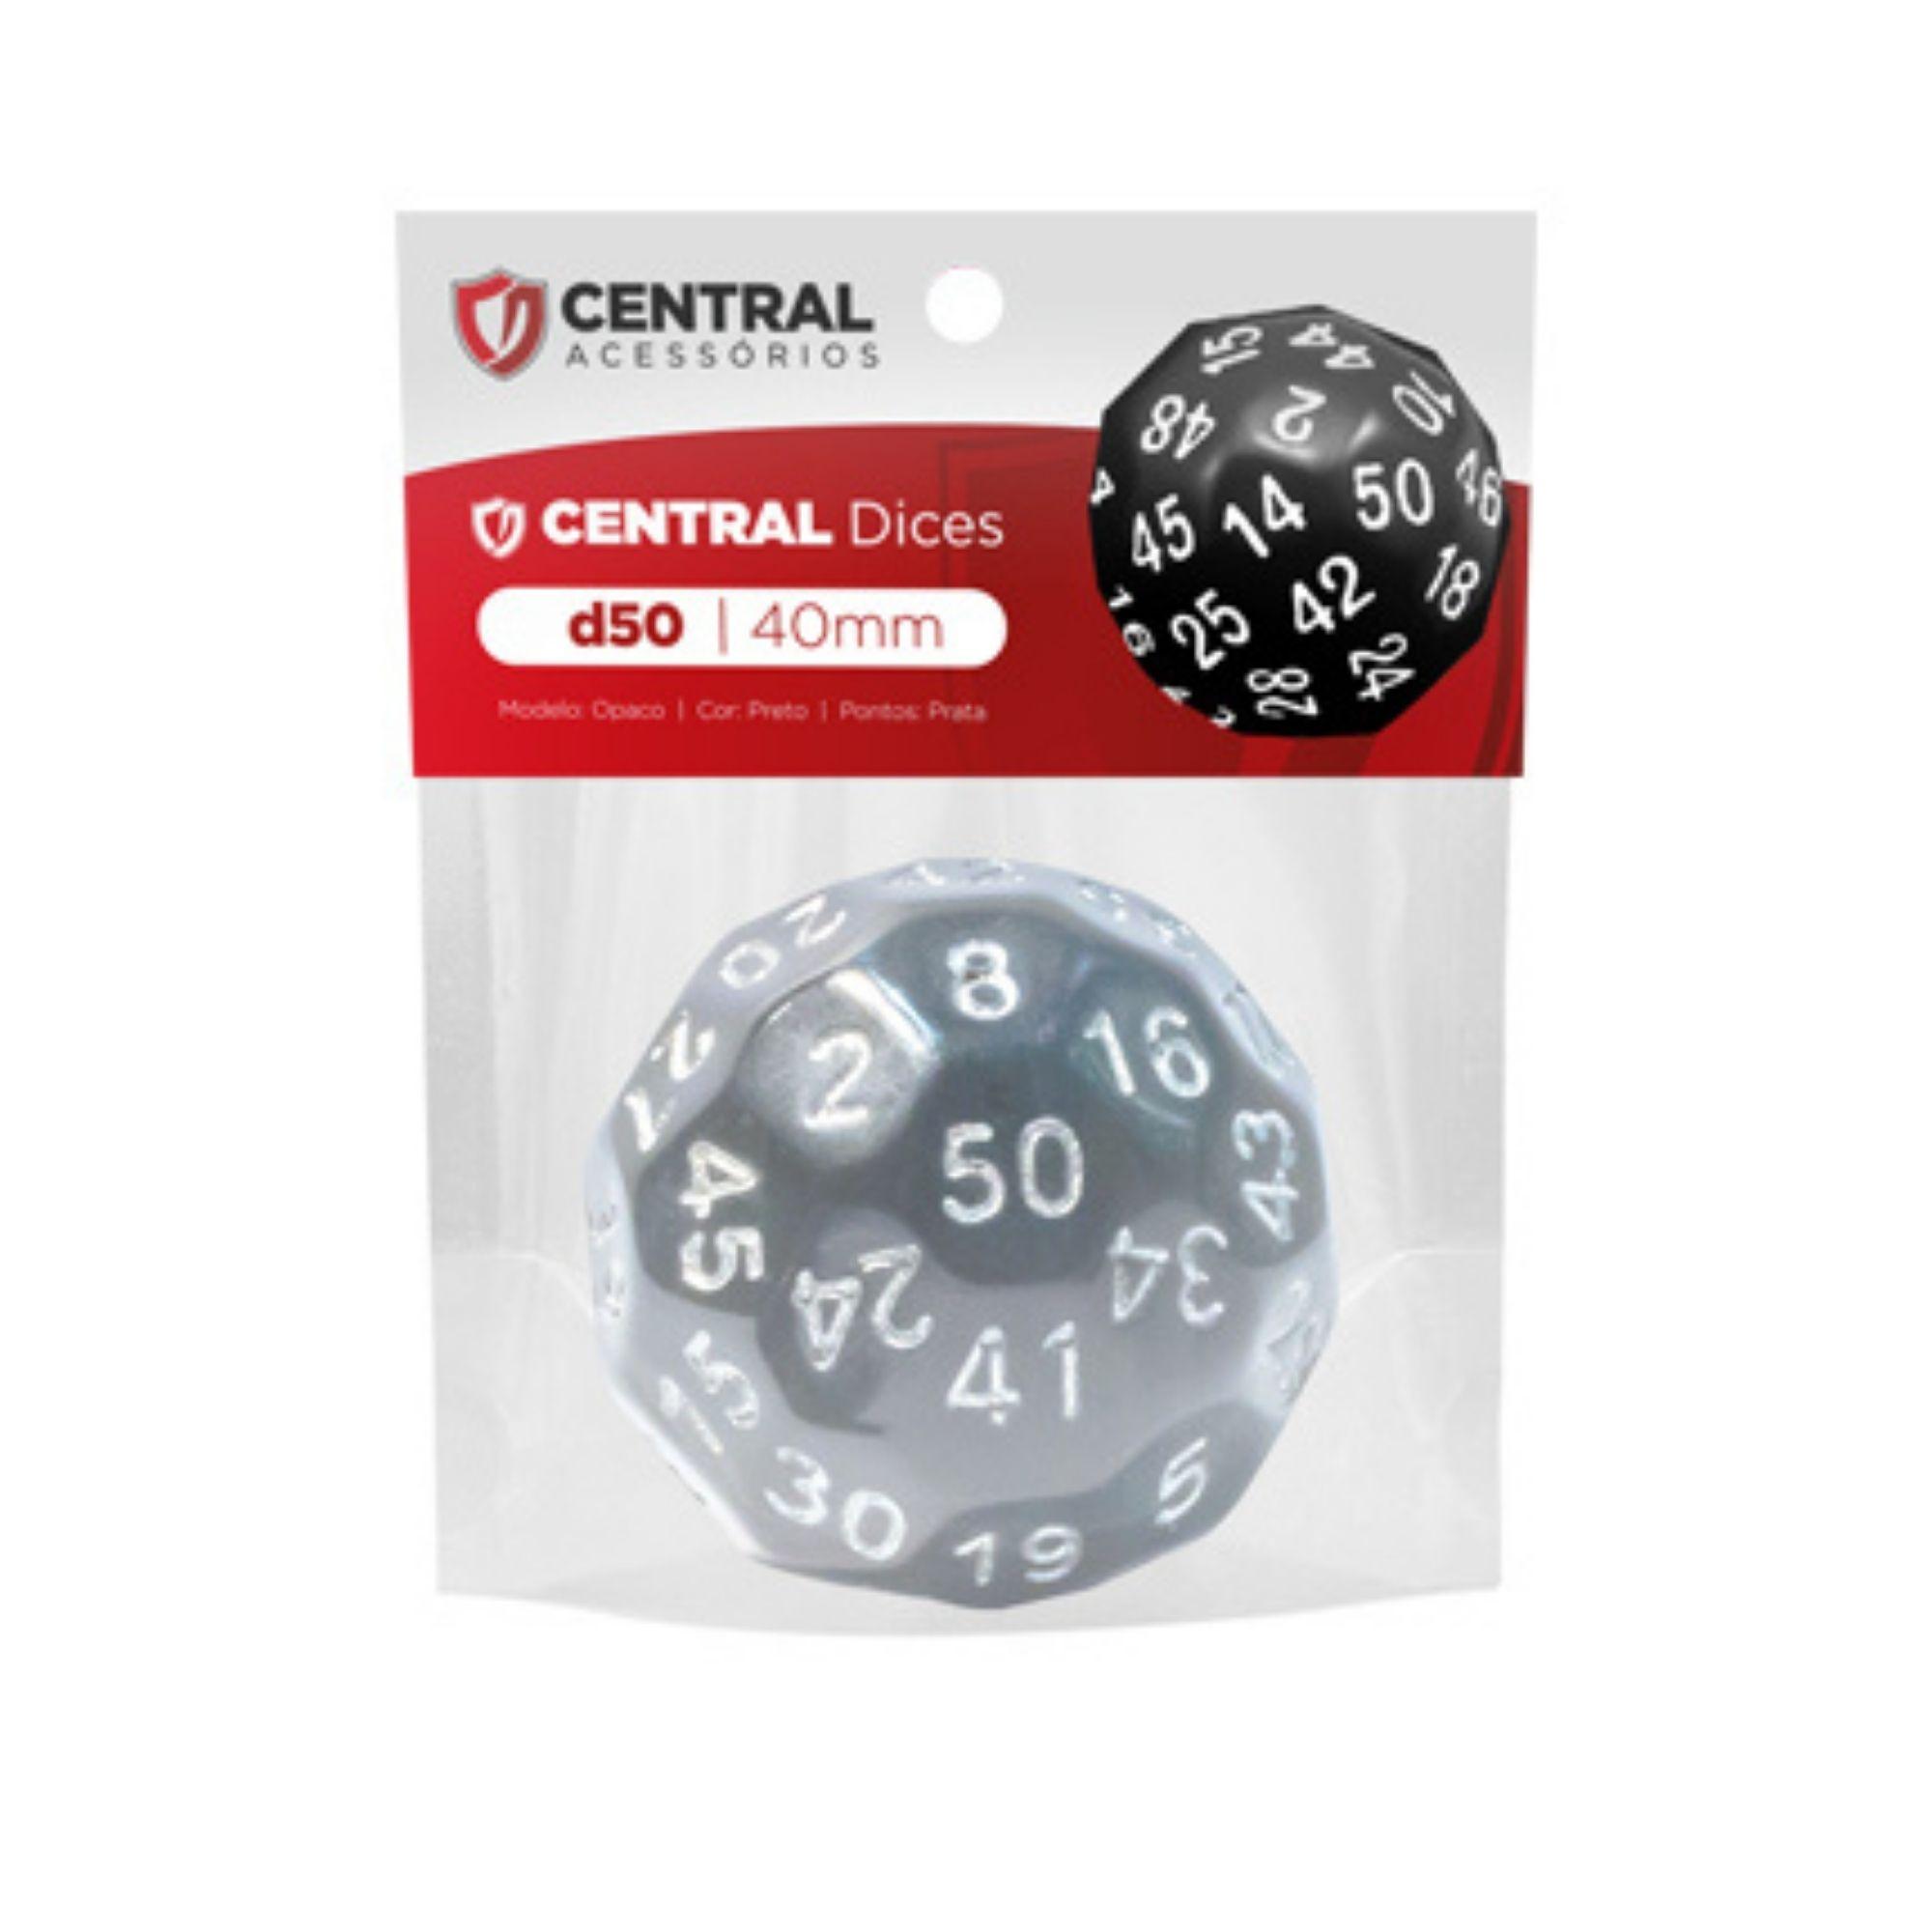 Central Dices D50 de 40mm Preto e Prata